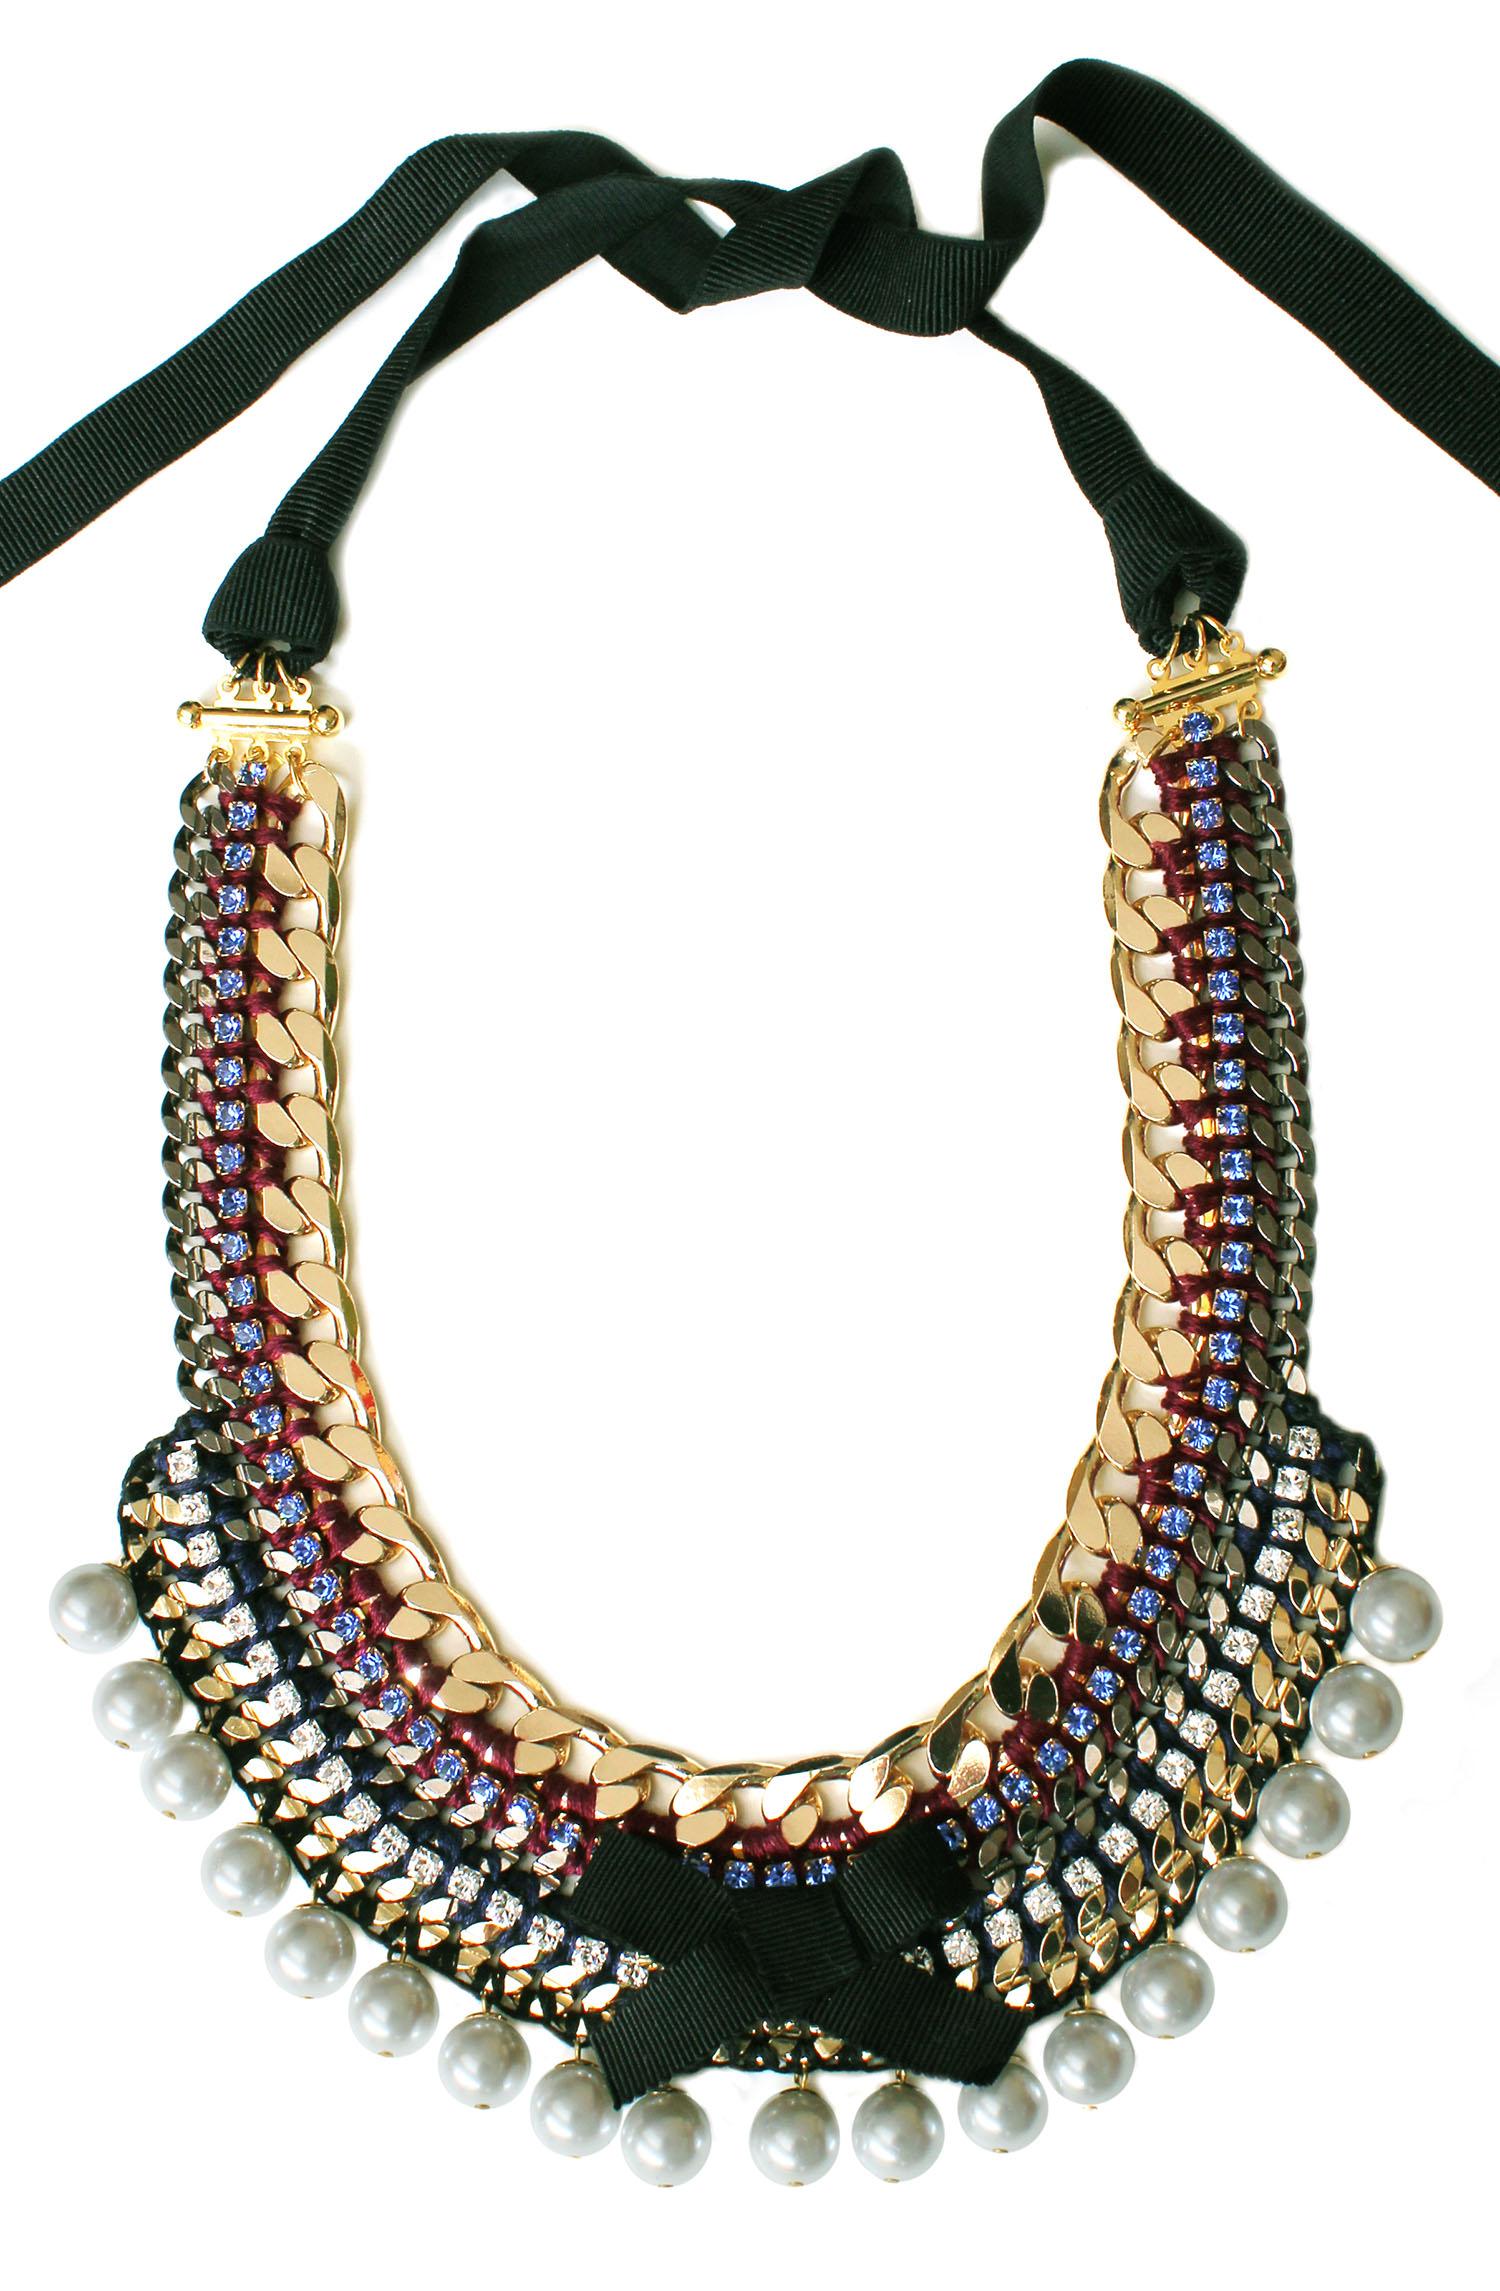 068 - Sapphire & Pearl Multi Necklace 2.jpg